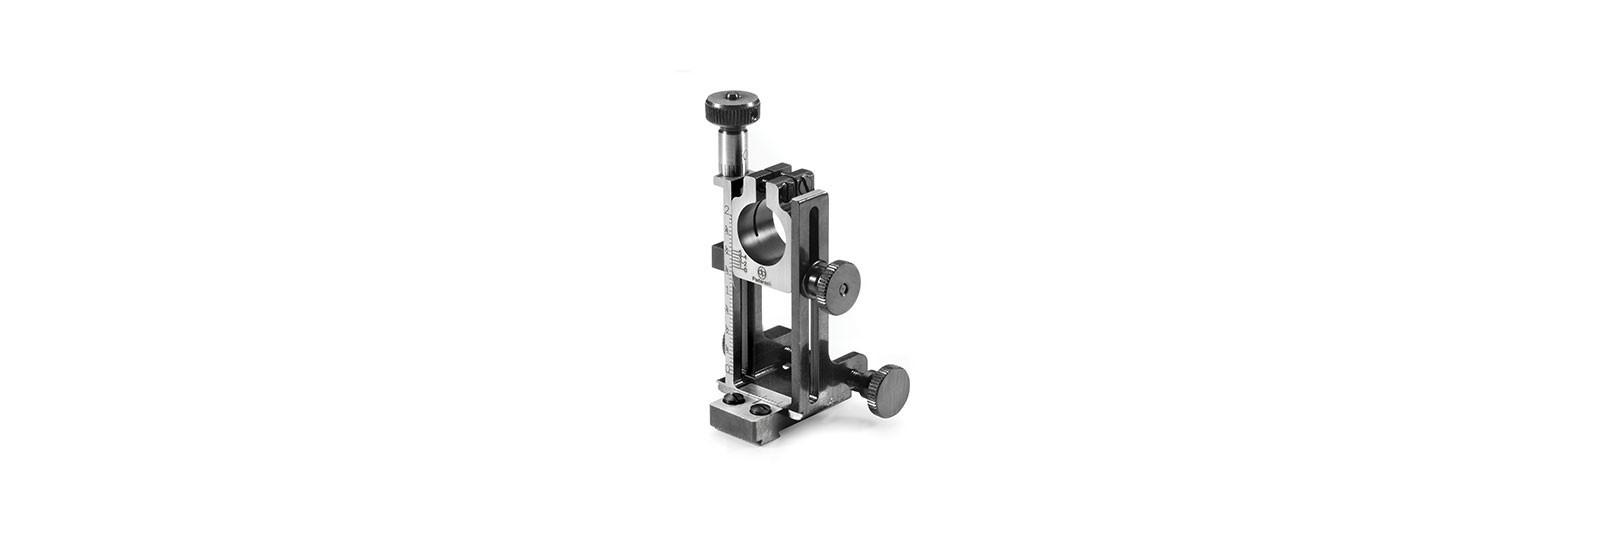 Adjustable base for malcom scope